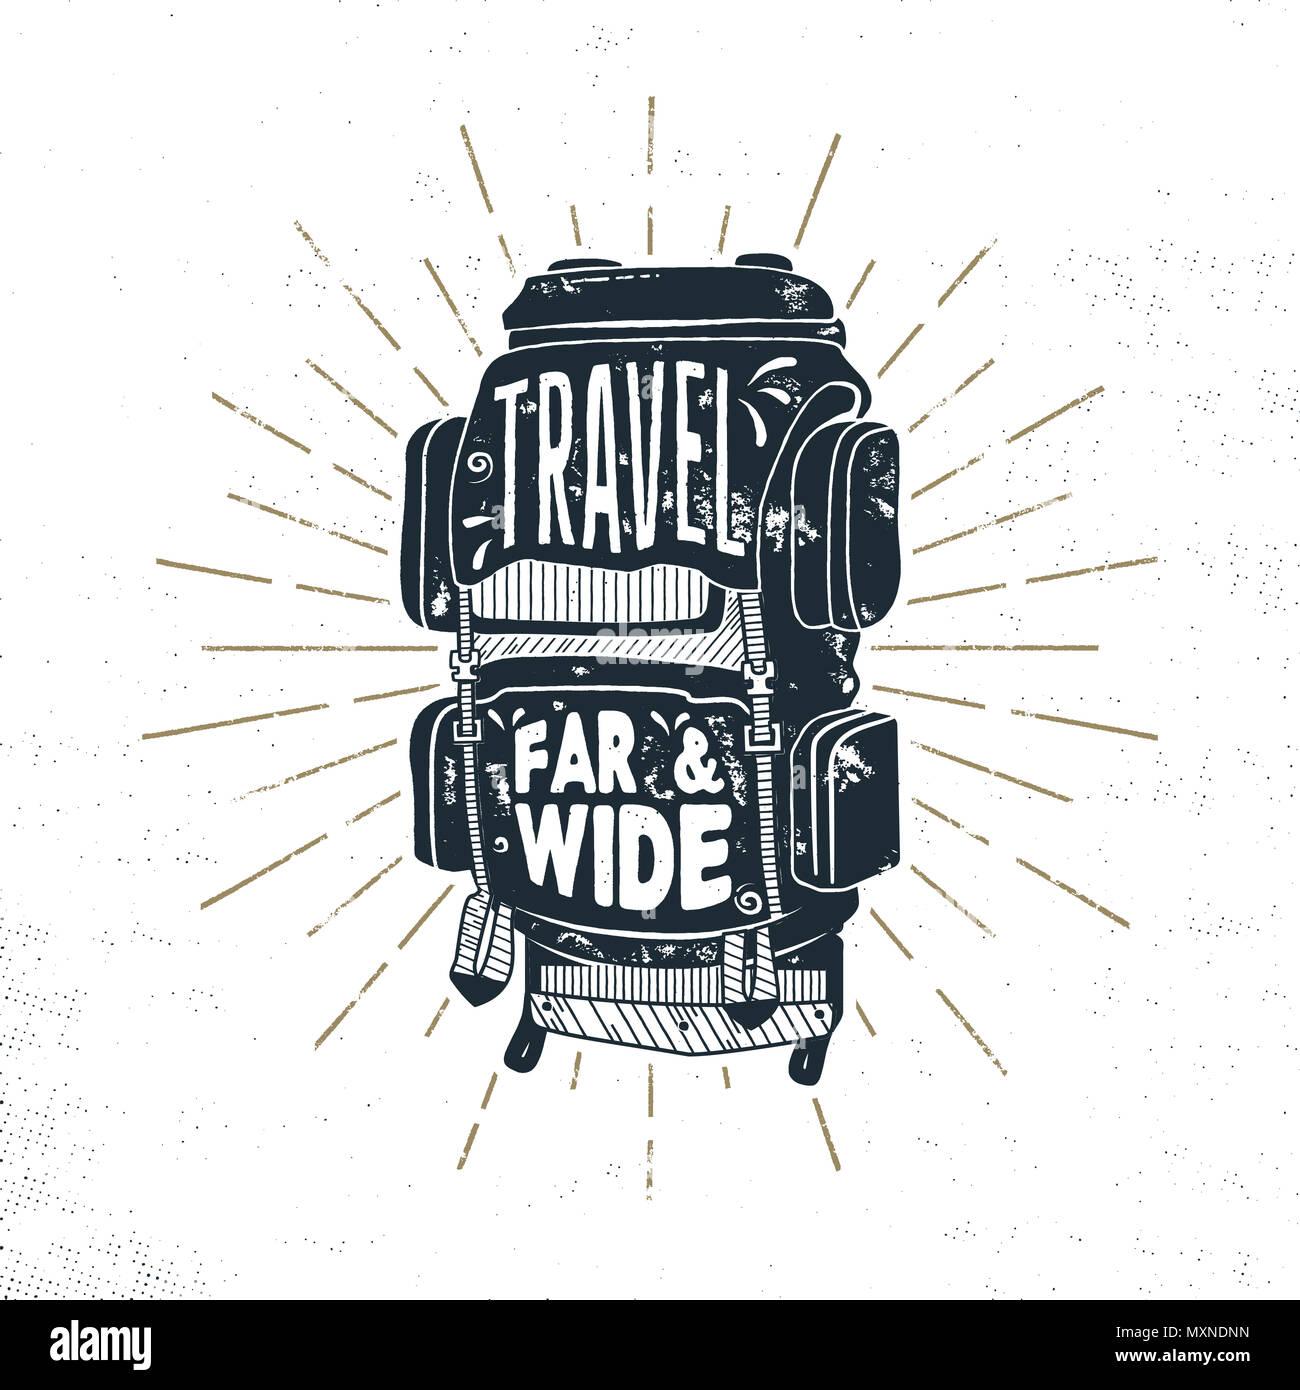 Vintage Hand Drawn Camper Backpack Design With Words Travel Far